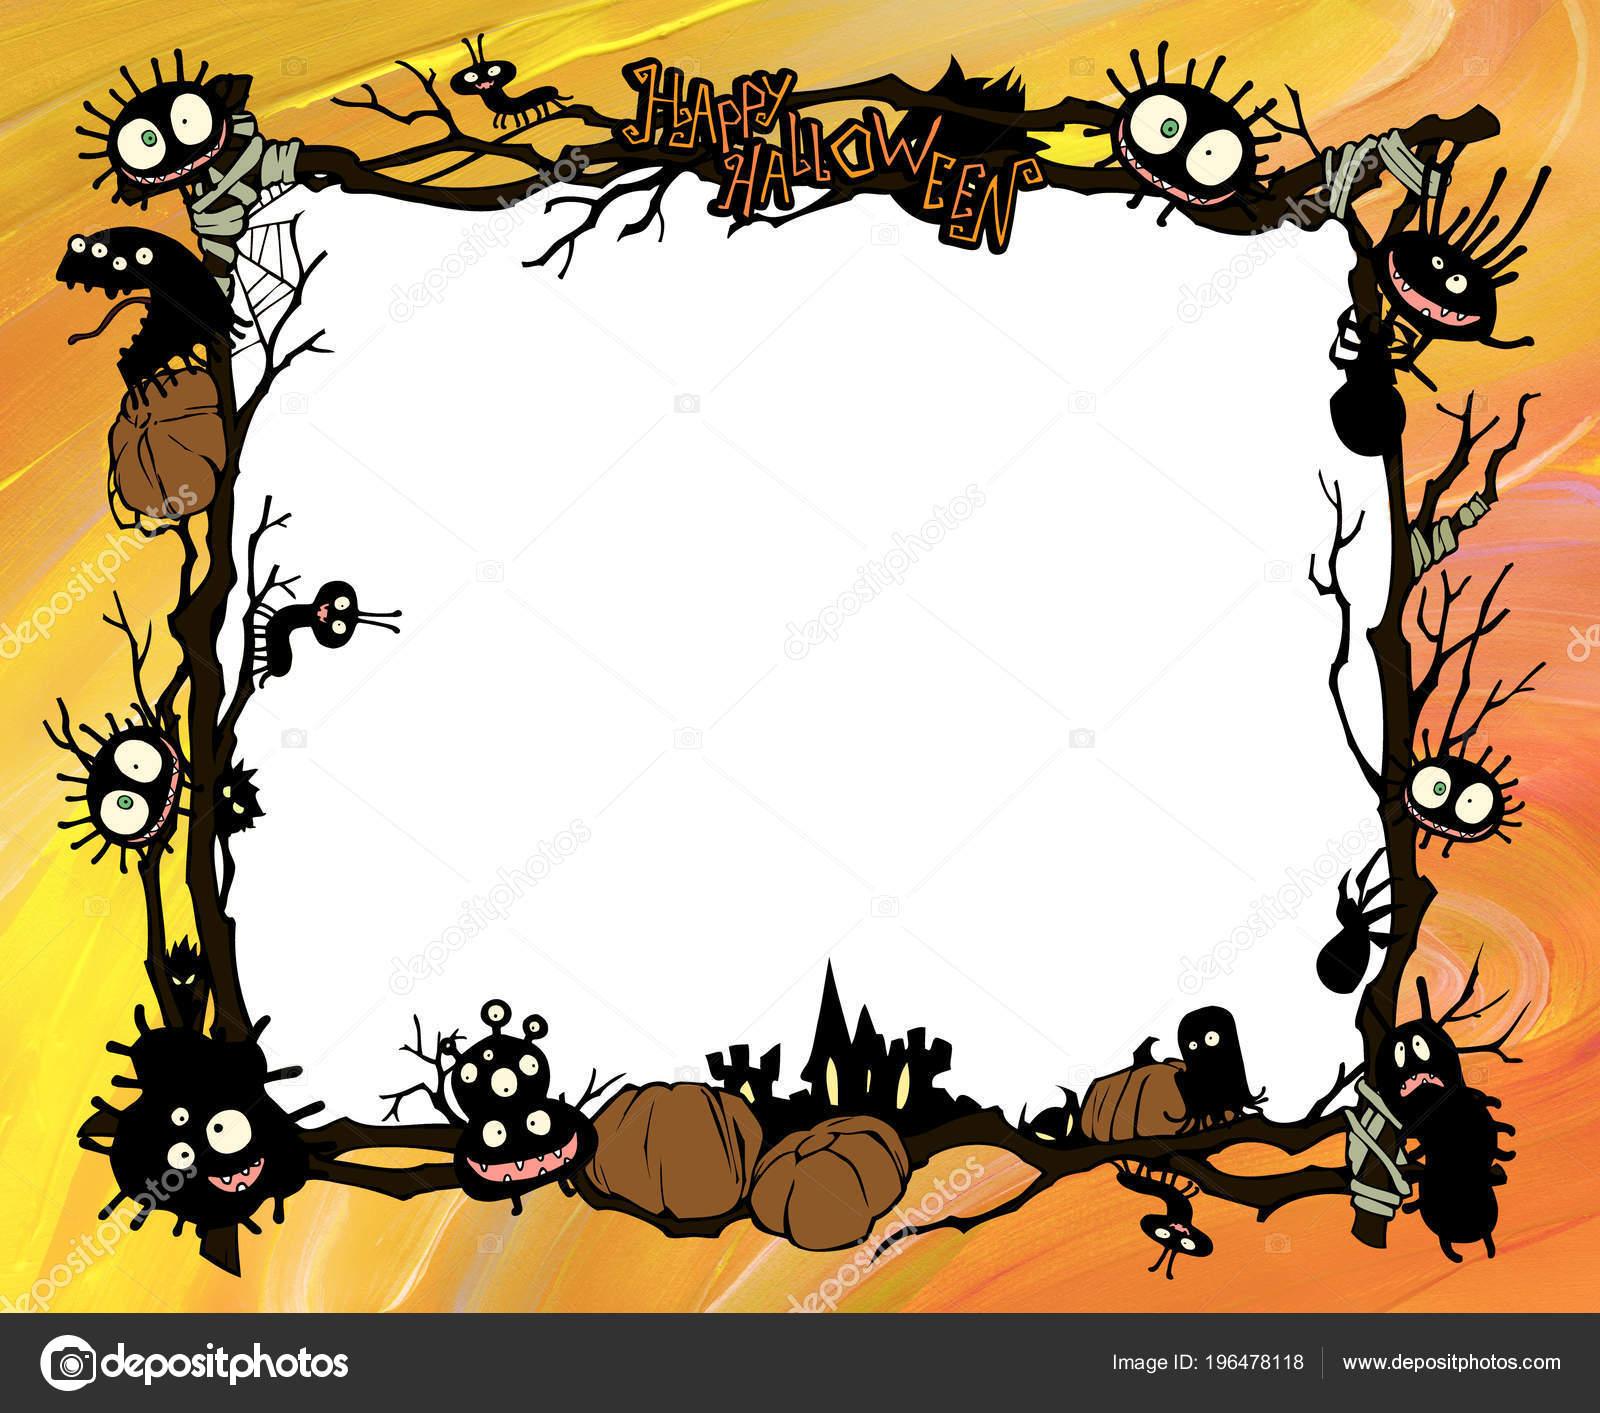 cartoon halloween frame illustration decorated diverse evil bizarre